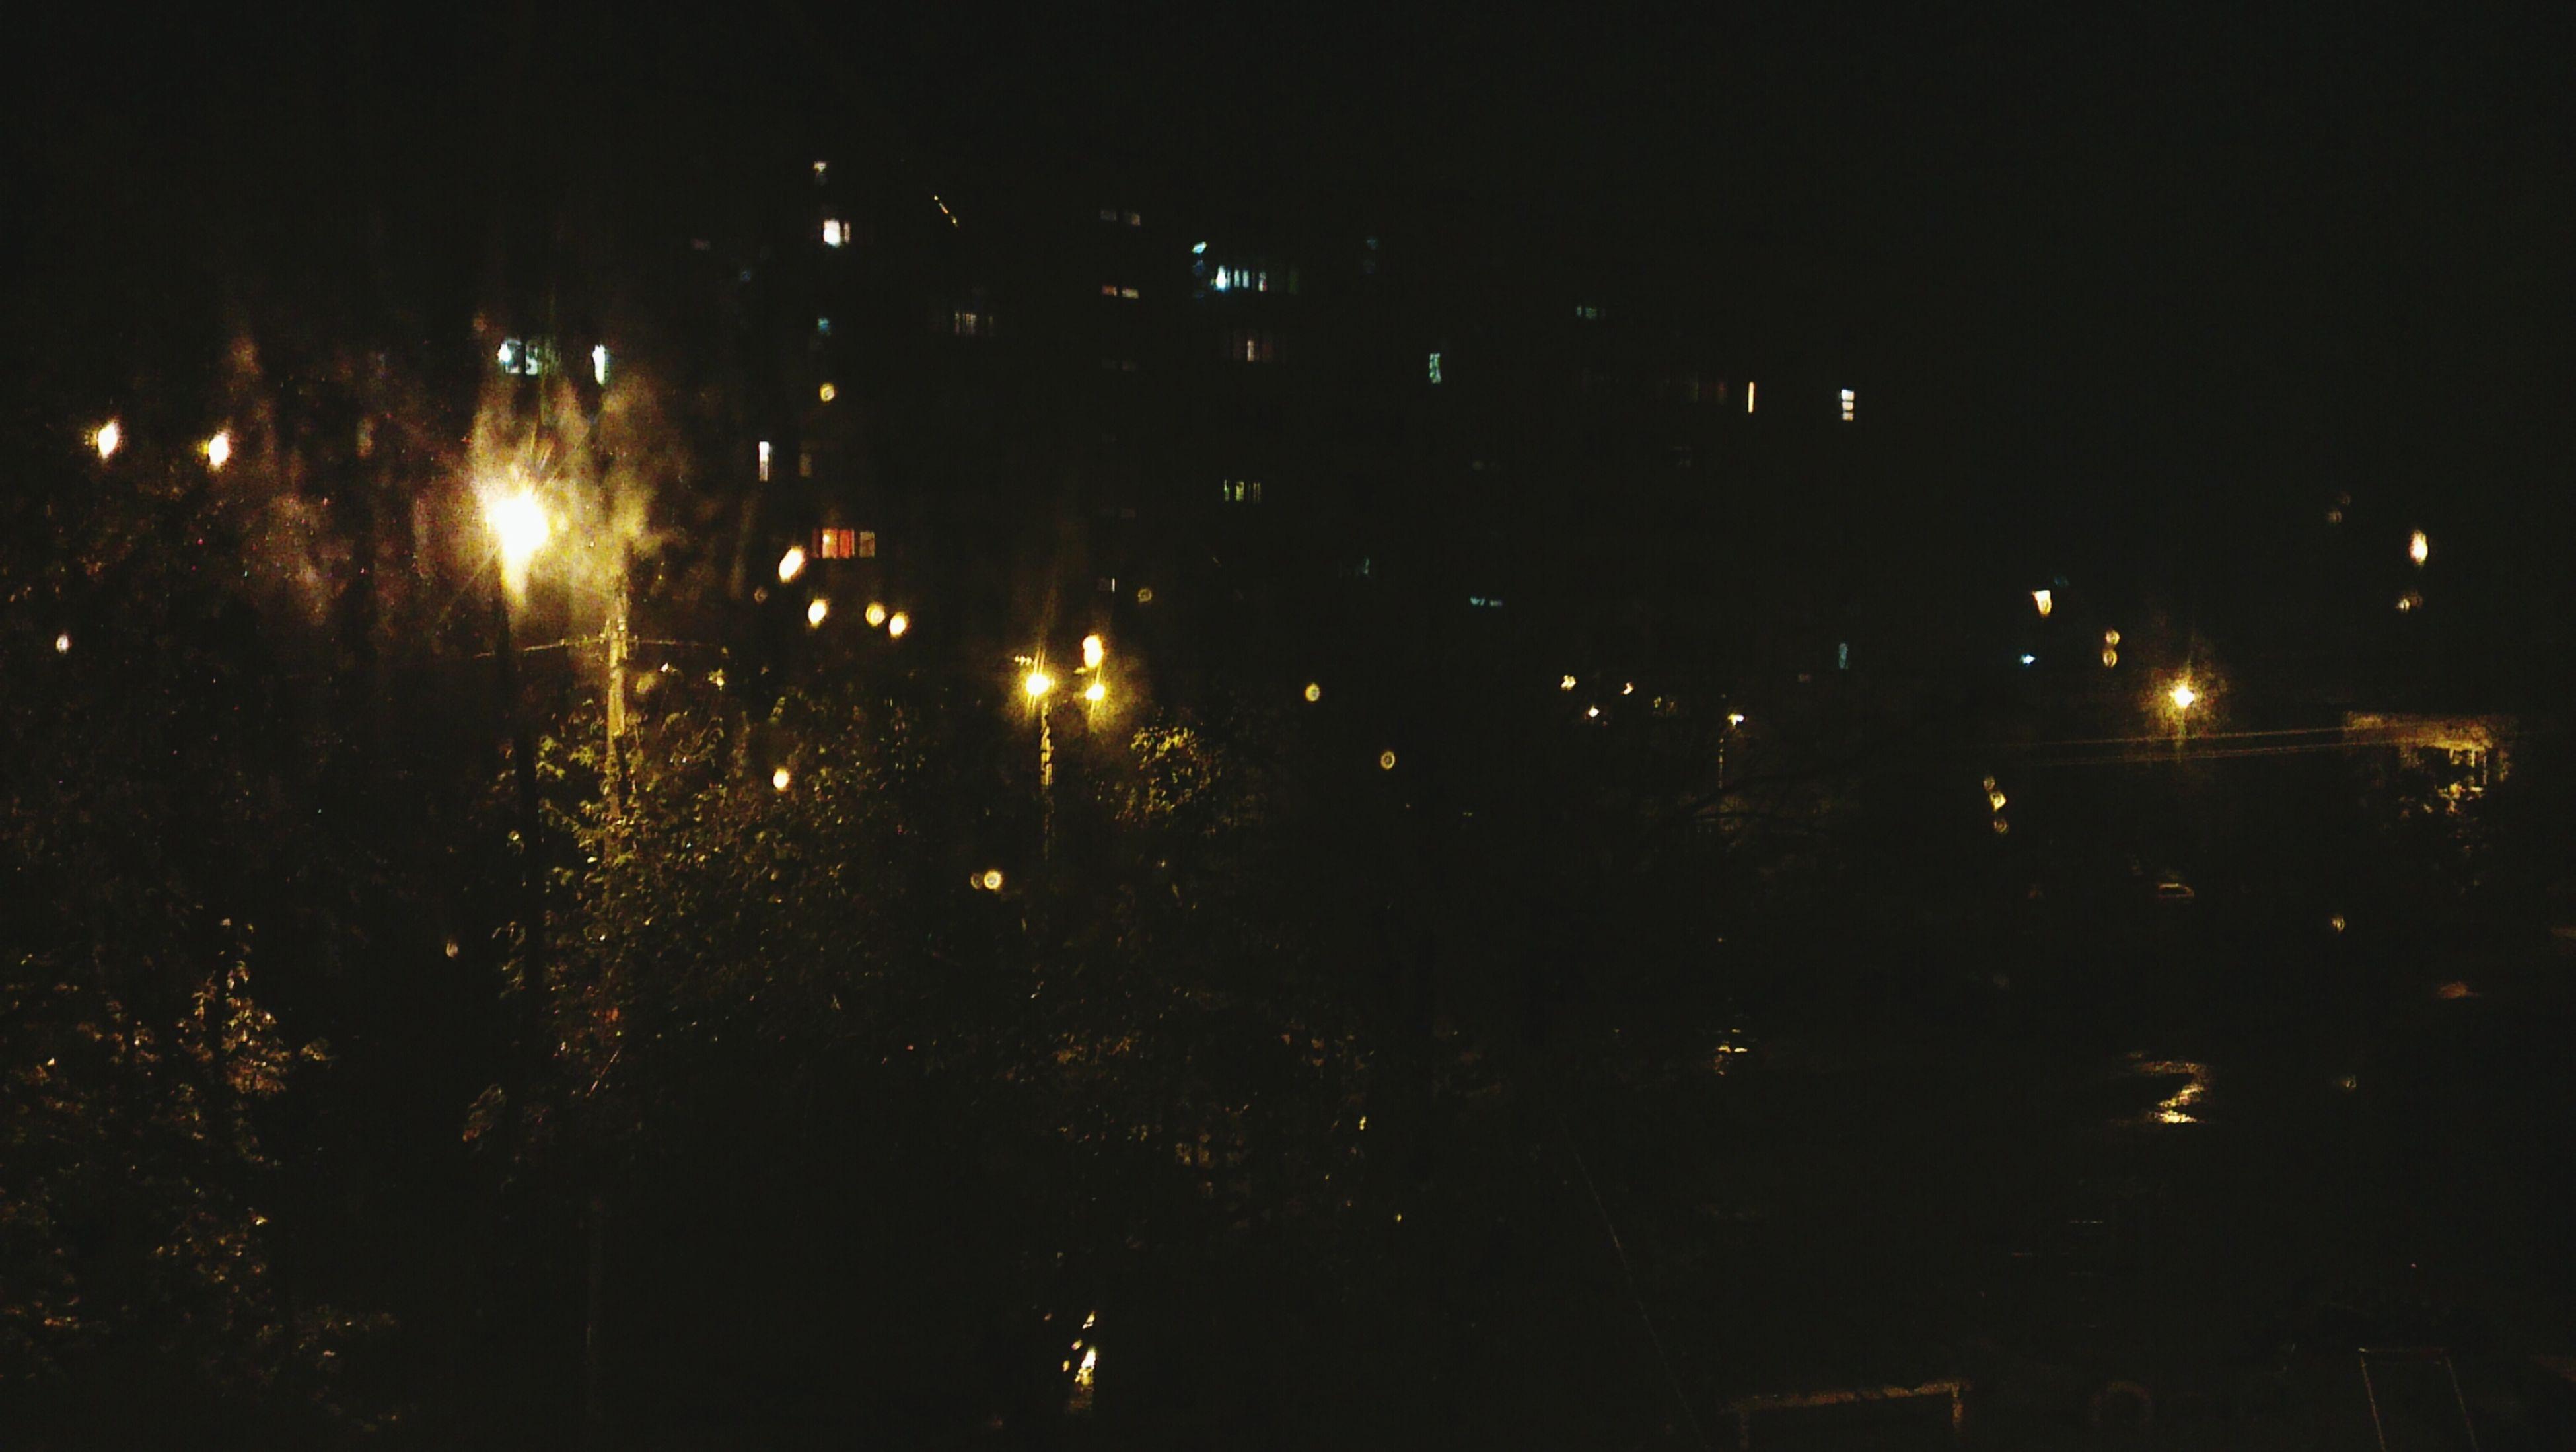 night, illuminated, lighting equipment, building exterior, street light, city, dark, built structure, architecture, light - natural phenomenon, outdoors, sky, no people, glowing, light, tree, street, residential building, residential structure, building